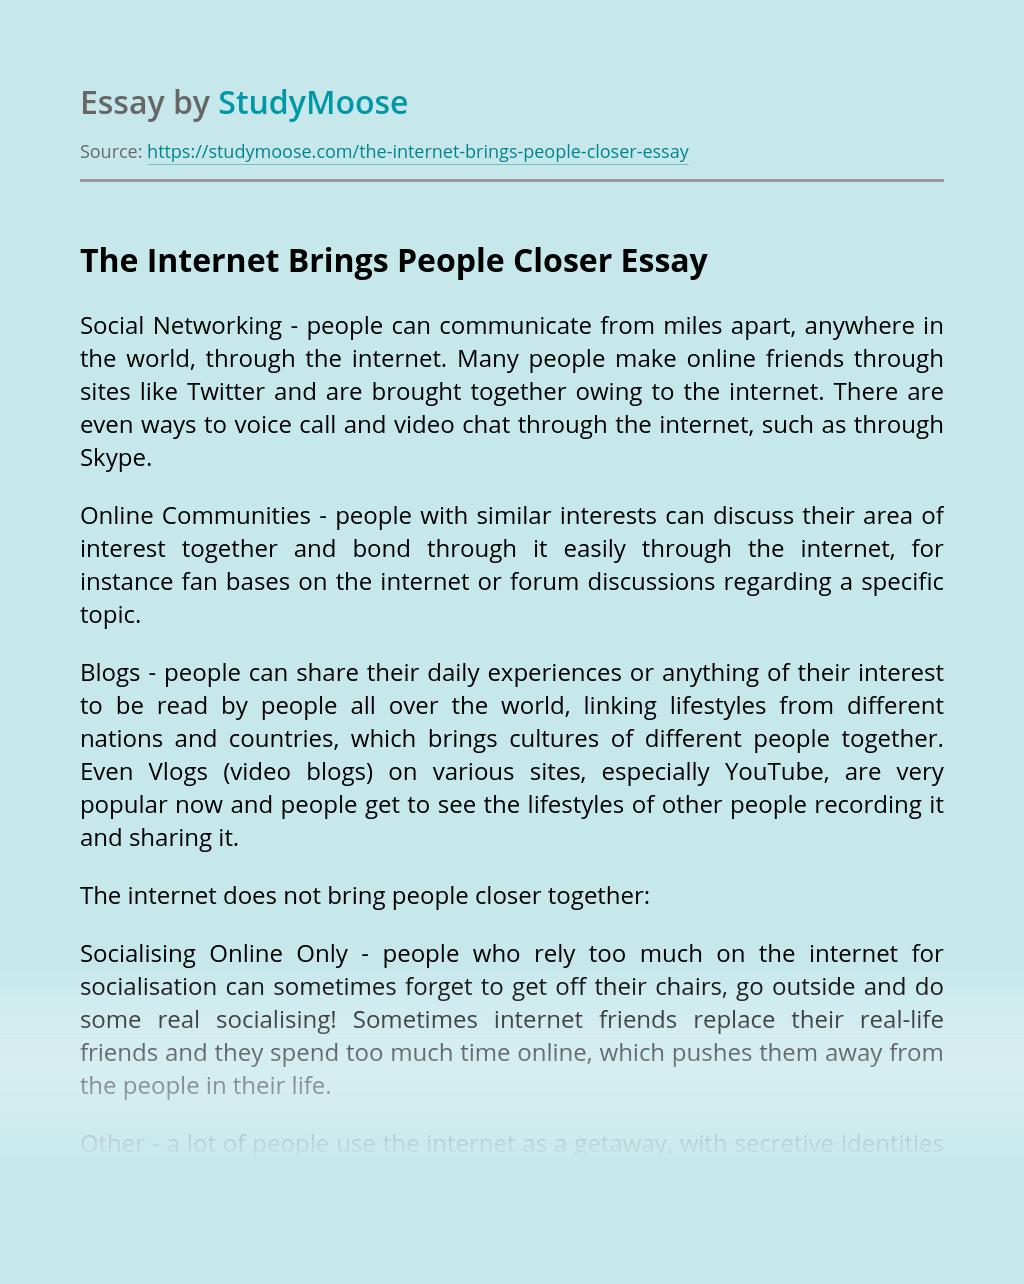 The Internet Brings People Closer